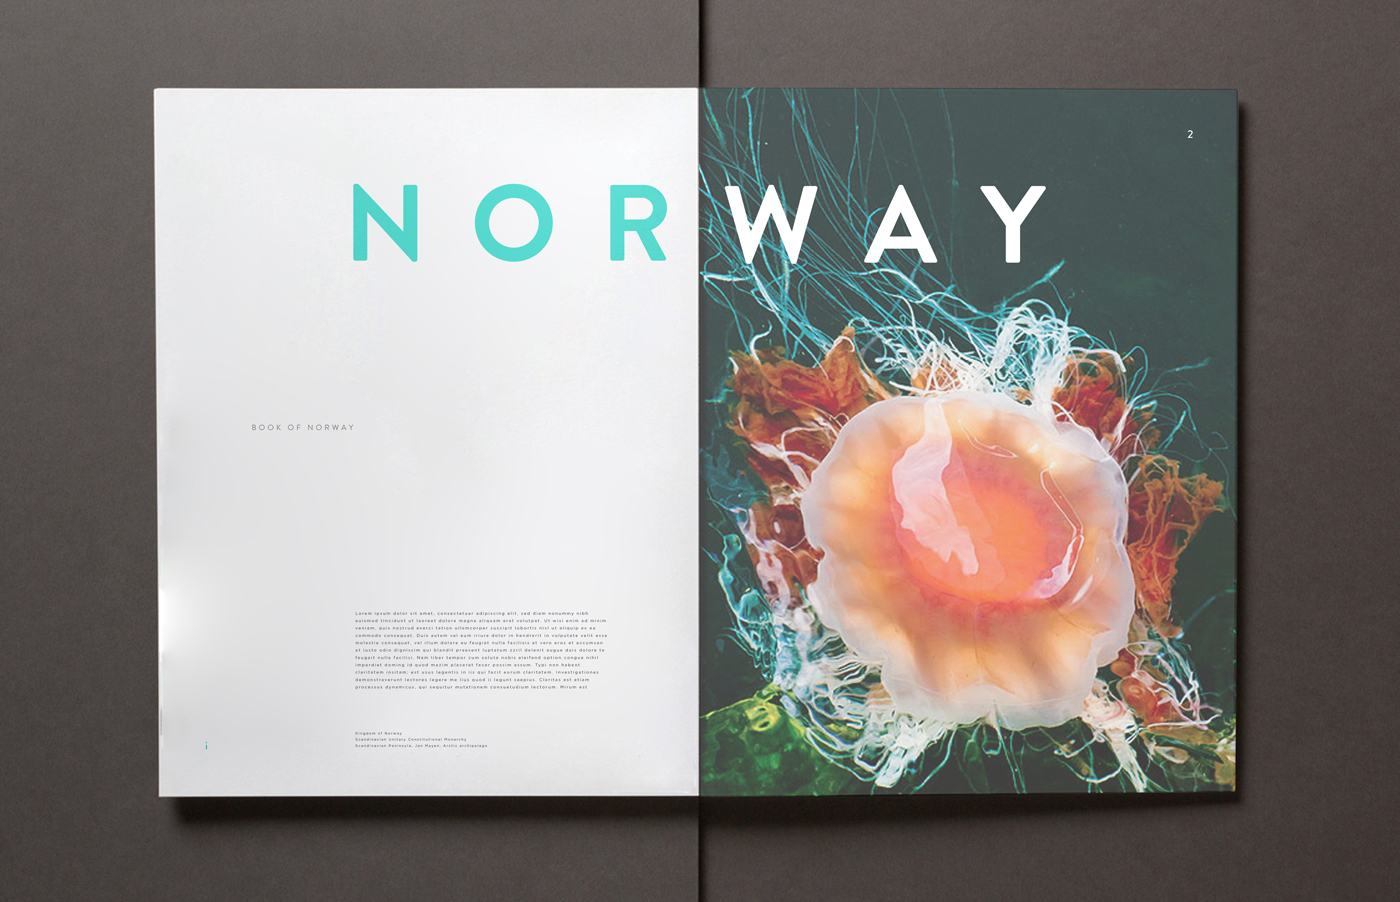 Norway-Spread-2.jpeg